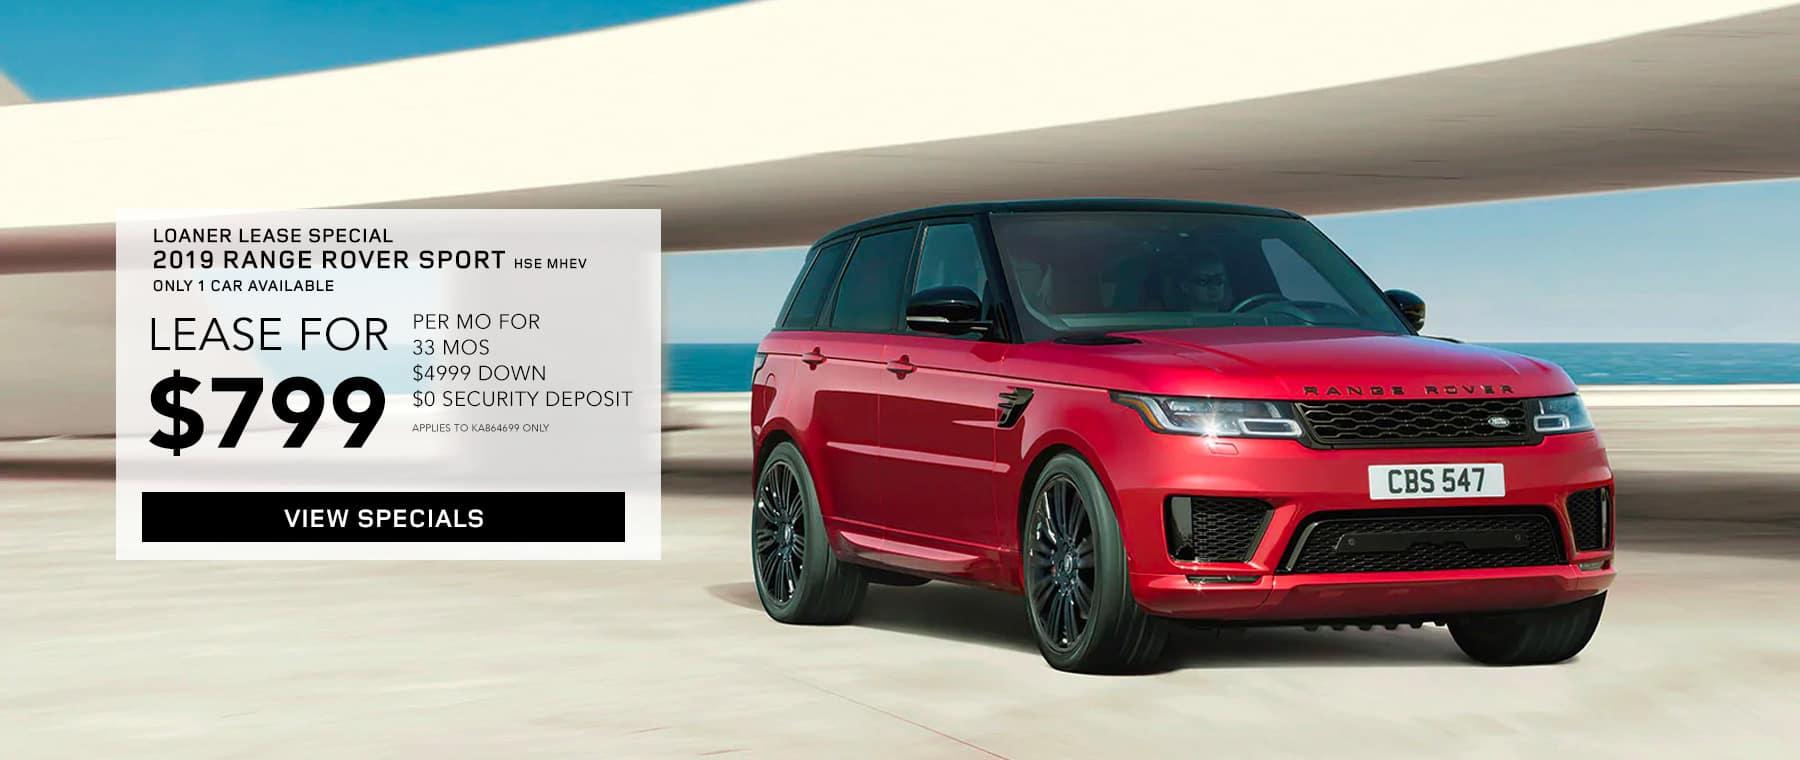 2019 Range Rover Sport HSE MHEV